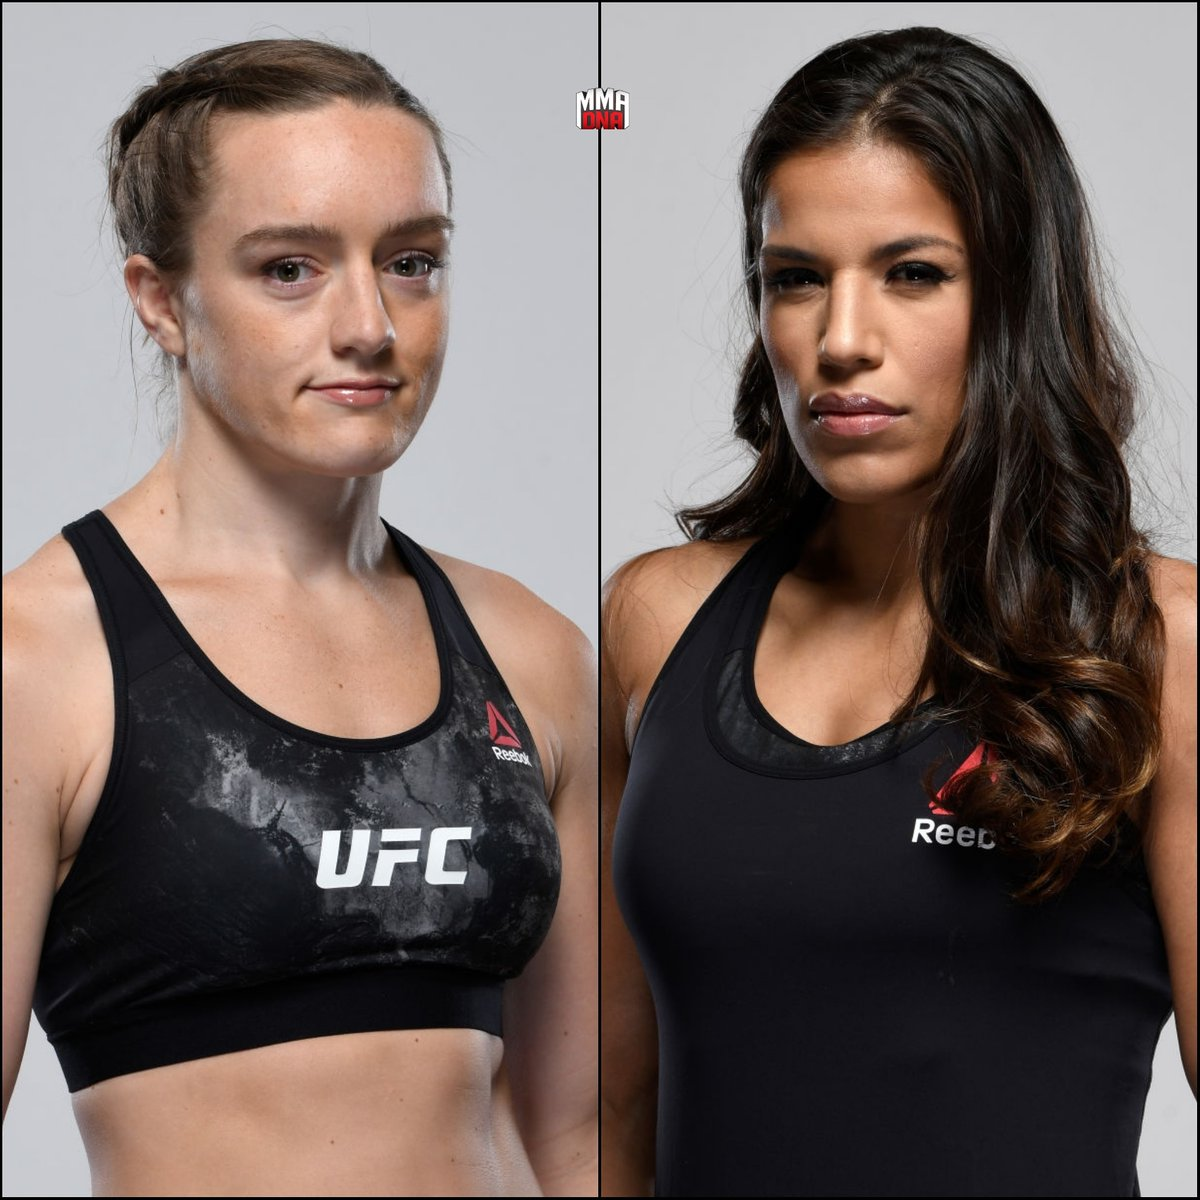 Aspen Ladd will fight Julianna Peña at #UFConESPN8 in Columbus, Ohio. (Mar. 28, 2020). (first rep. @bokamotoESPN) #UFC #UFCColumbus #MMA #UFCESPN #WMMA